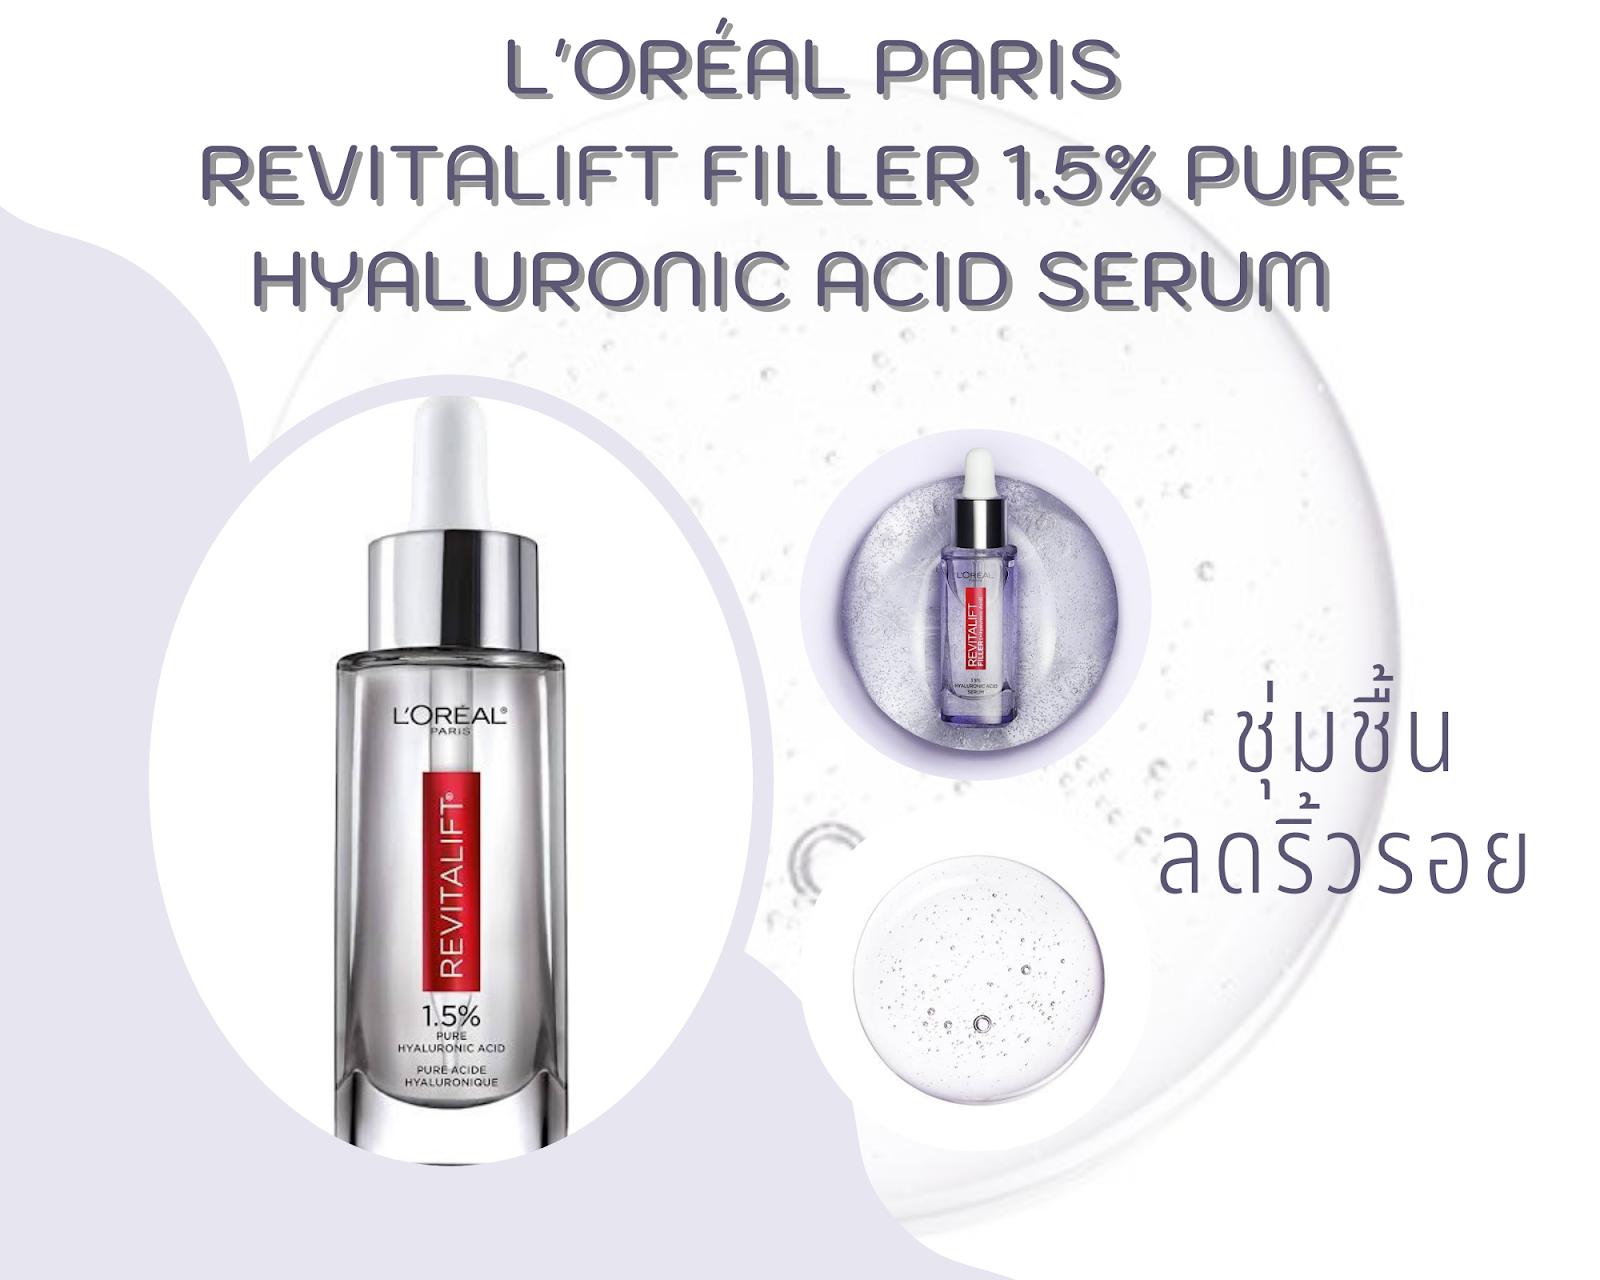 2. L'Oréal Paris Revitalift Filler 1.5% Pure Hyaluronic Acid Serum